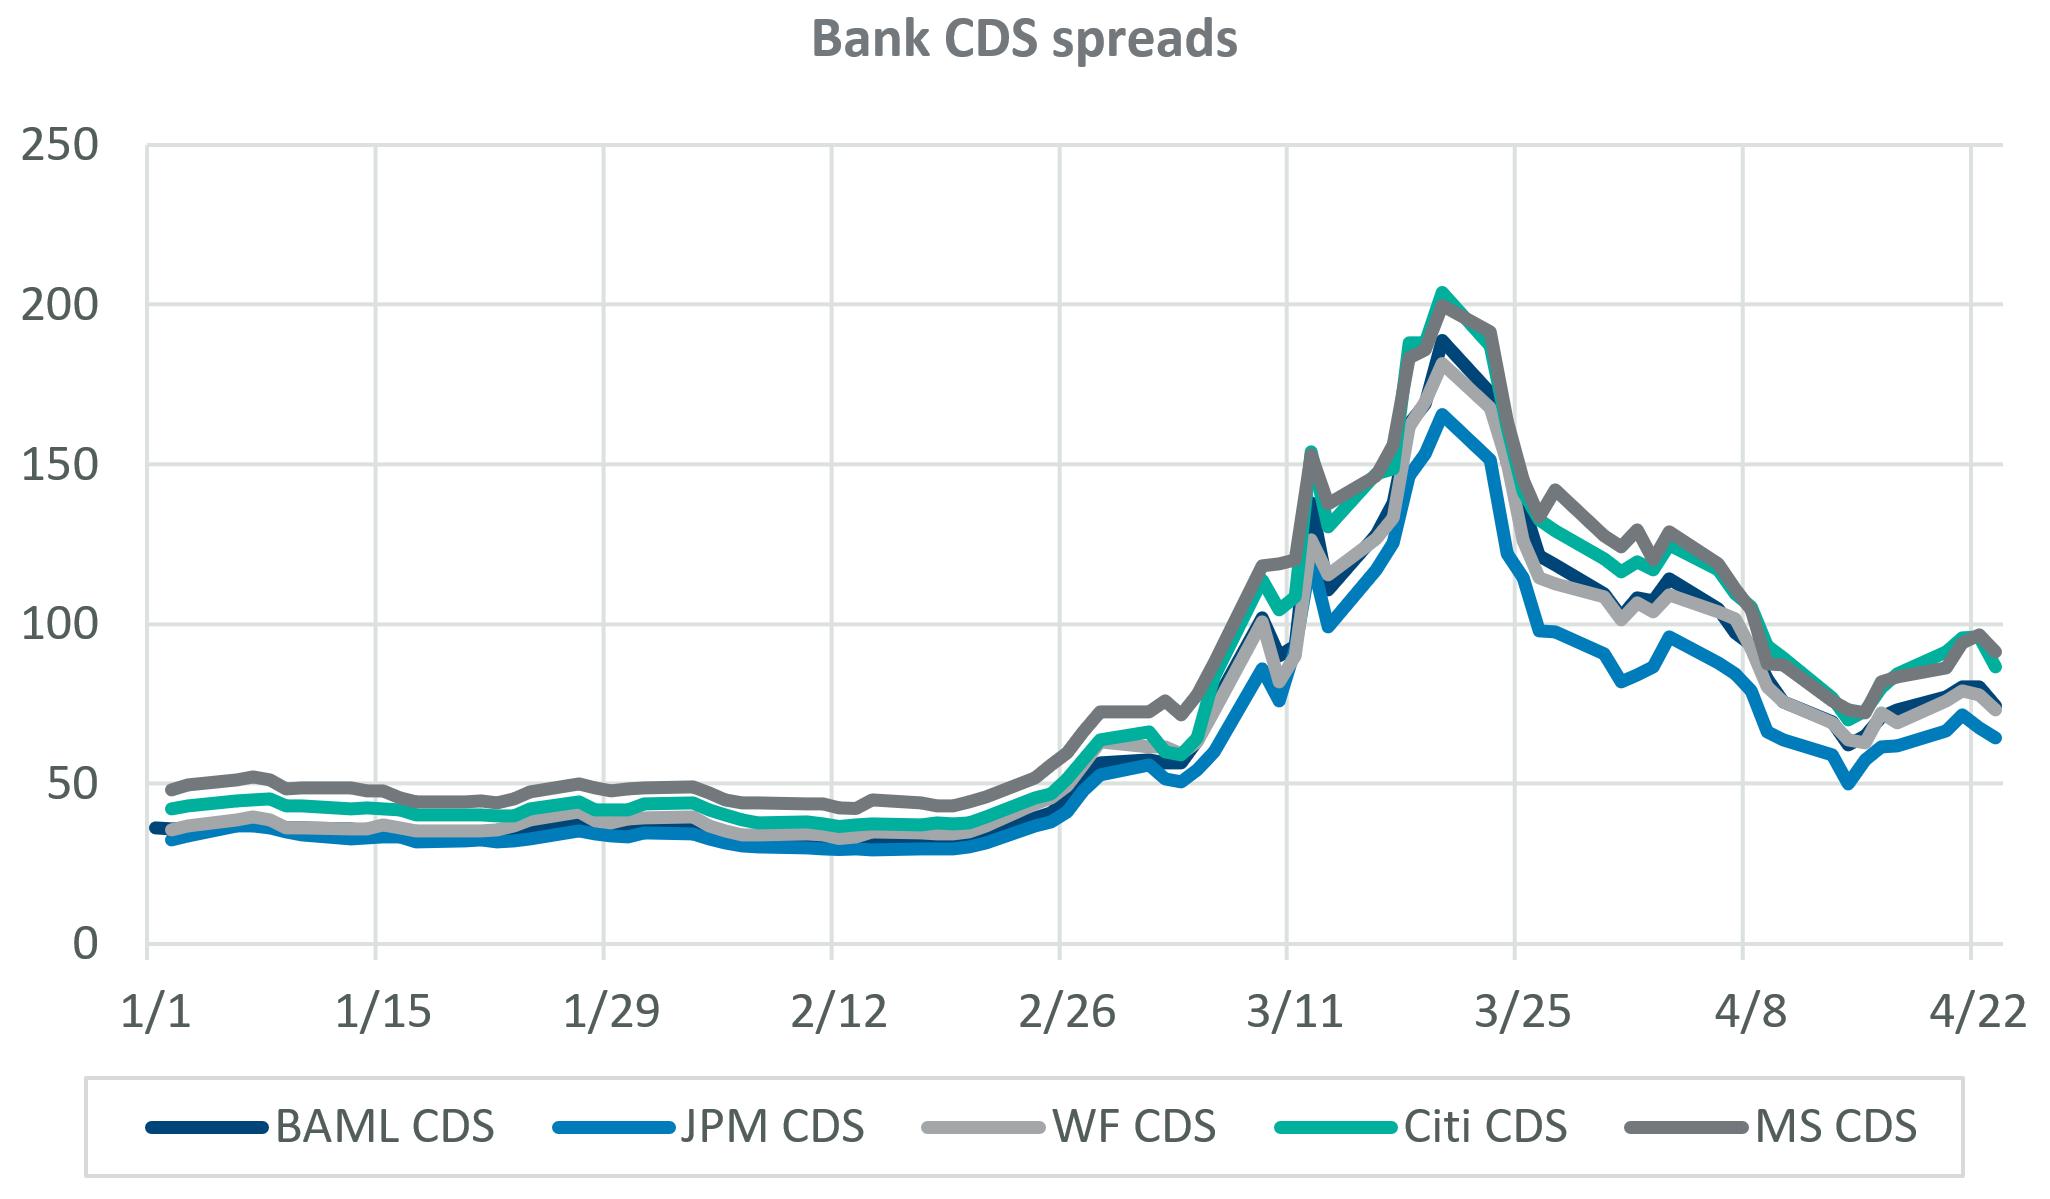 Bank CDS spreads